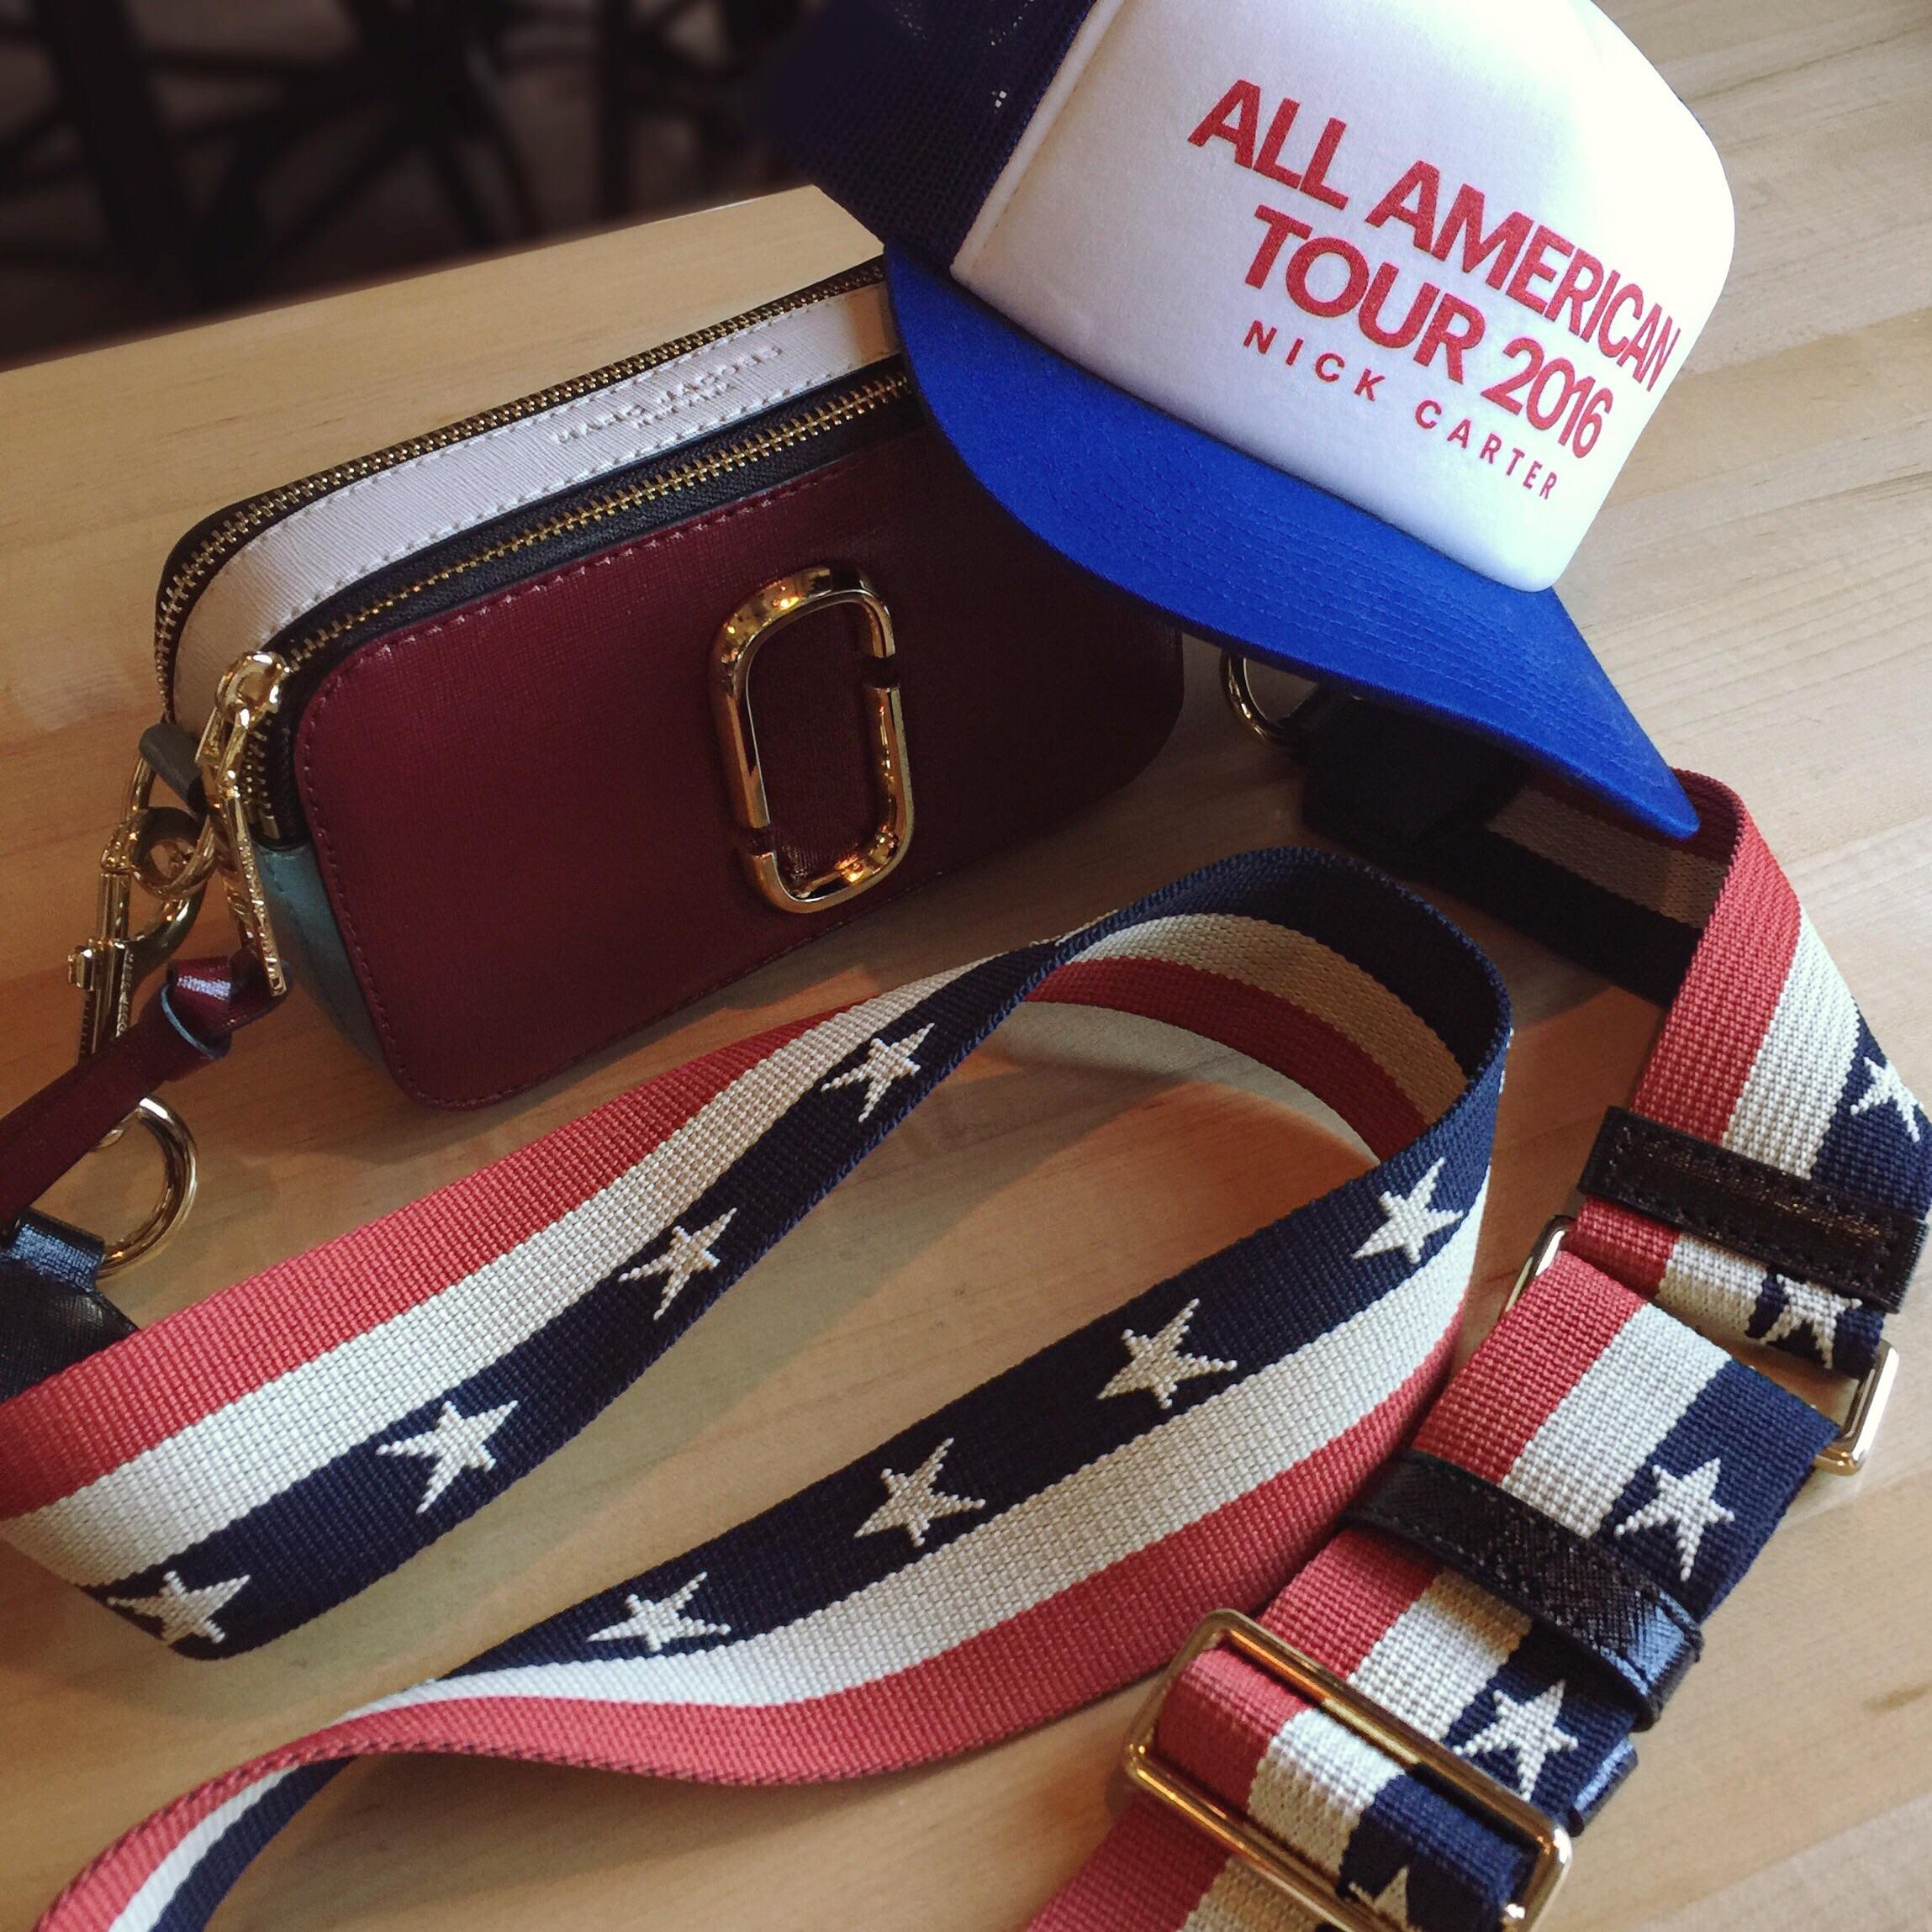 Hat:  Nick Carter Merch  Crossbody bag:  Marc Jacobs